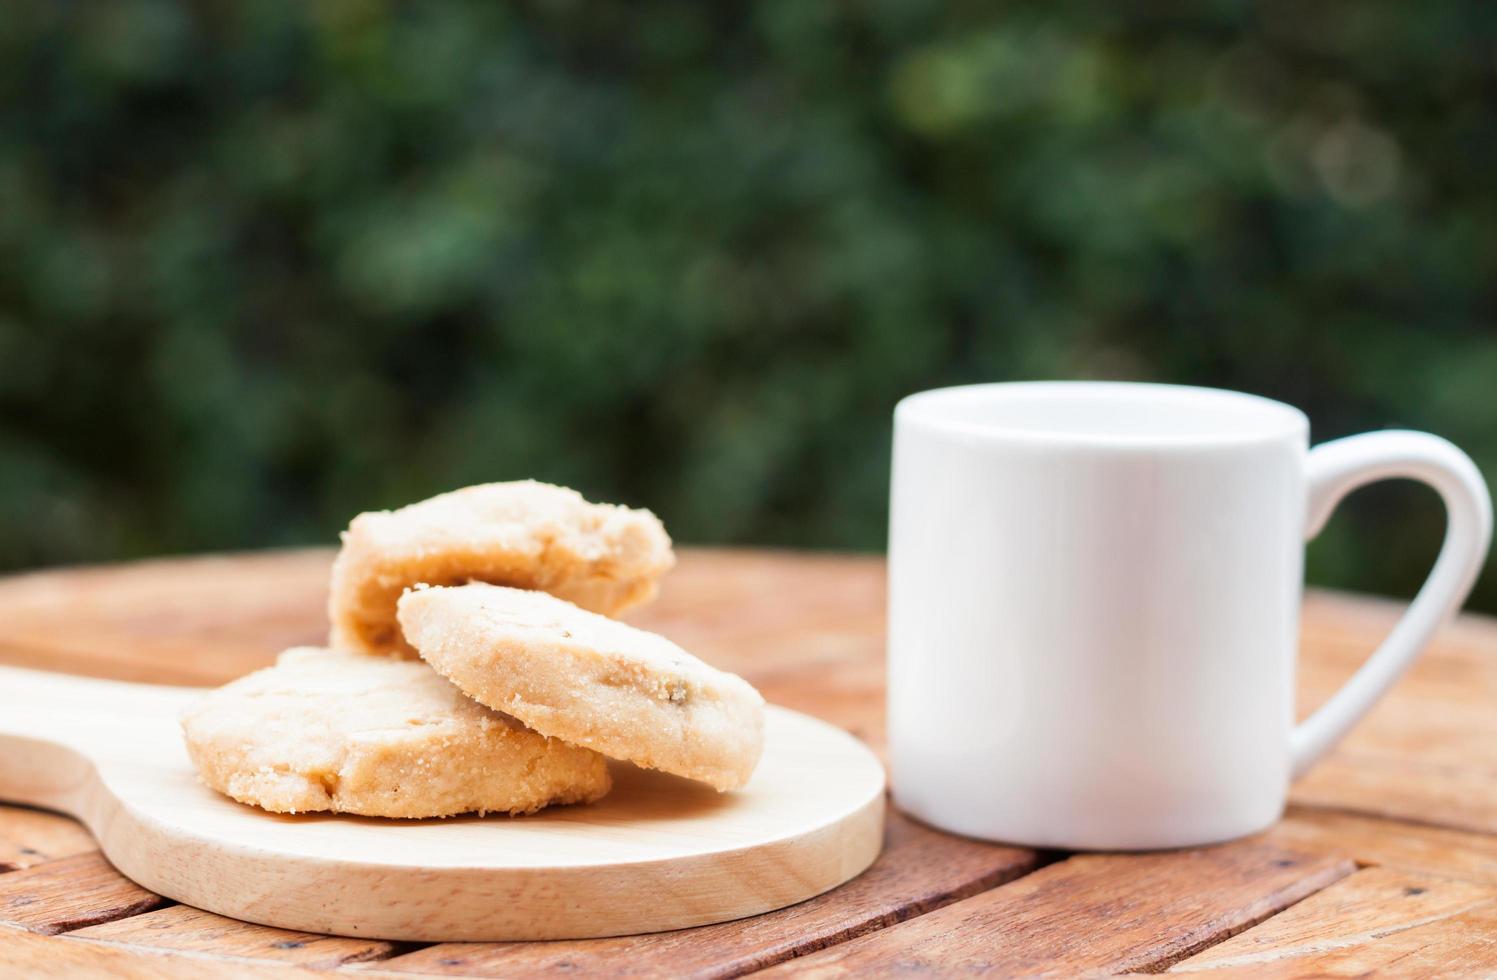 biscotti di anacardi con una tazza di caffè foto